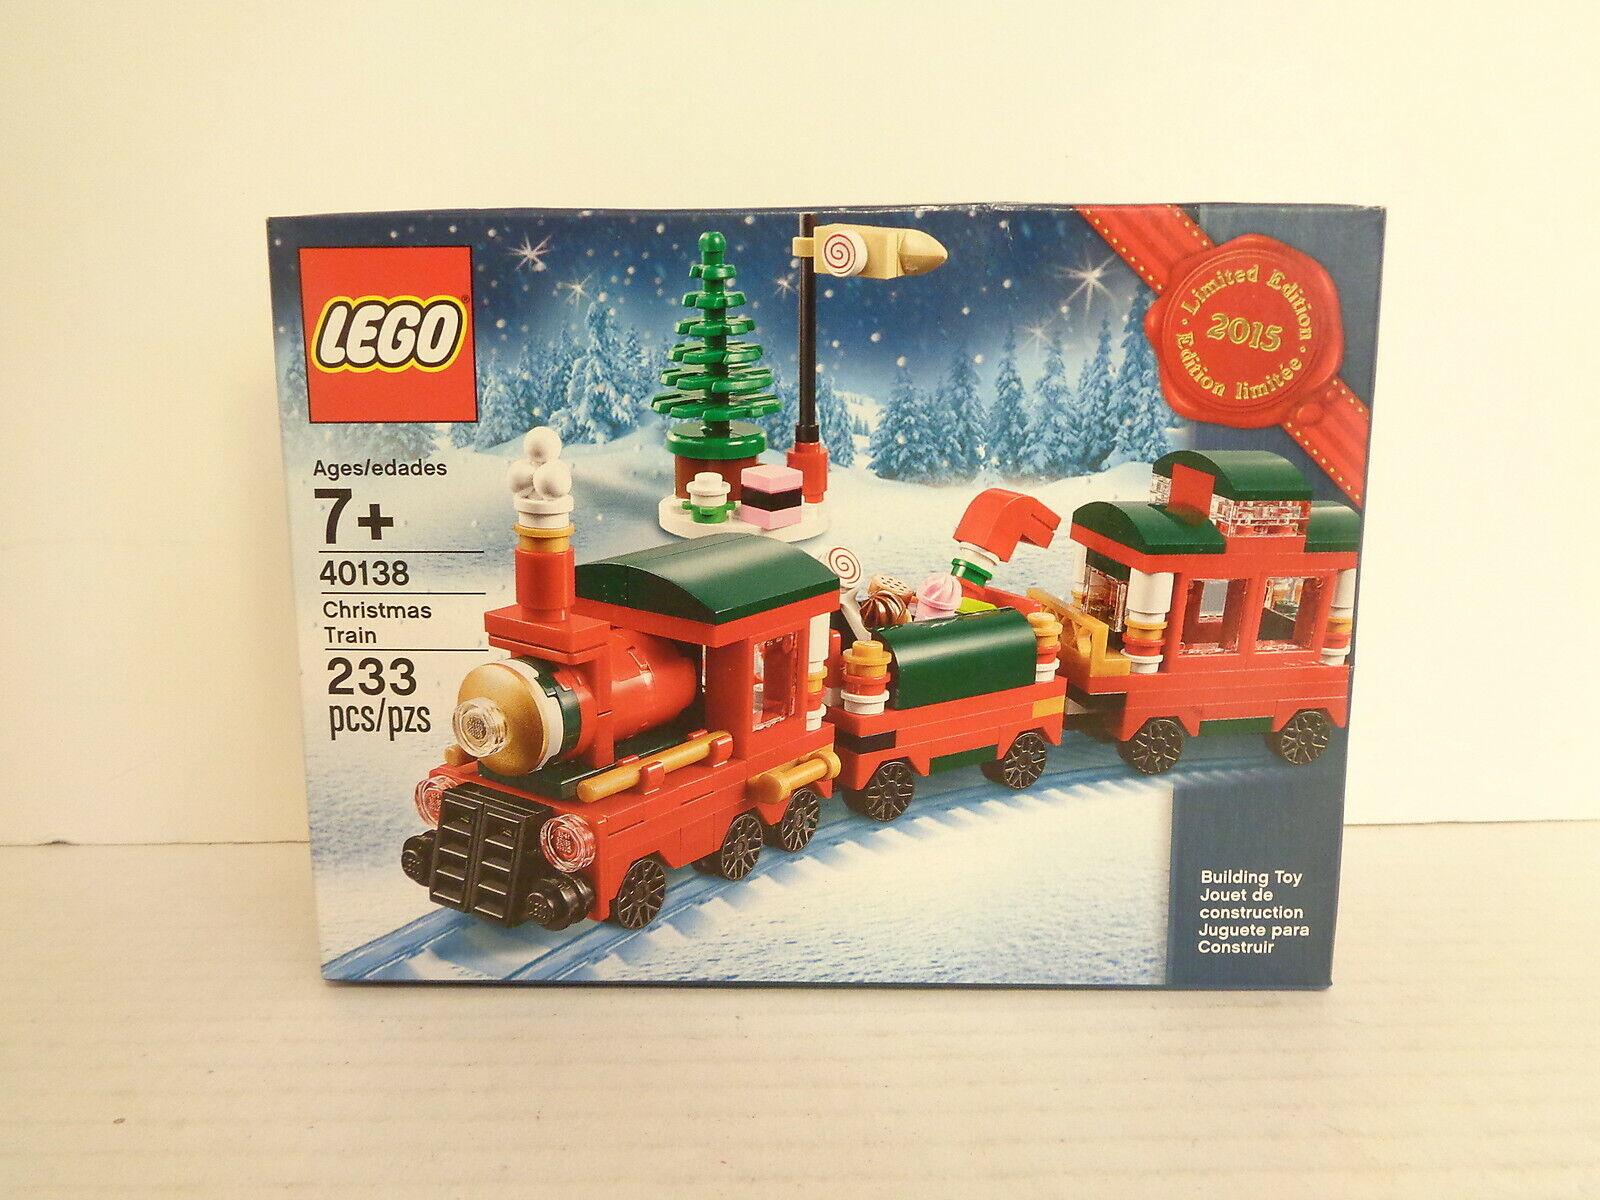 Lego Edition Christmas Train Limited Building 2015 RLq45j3A